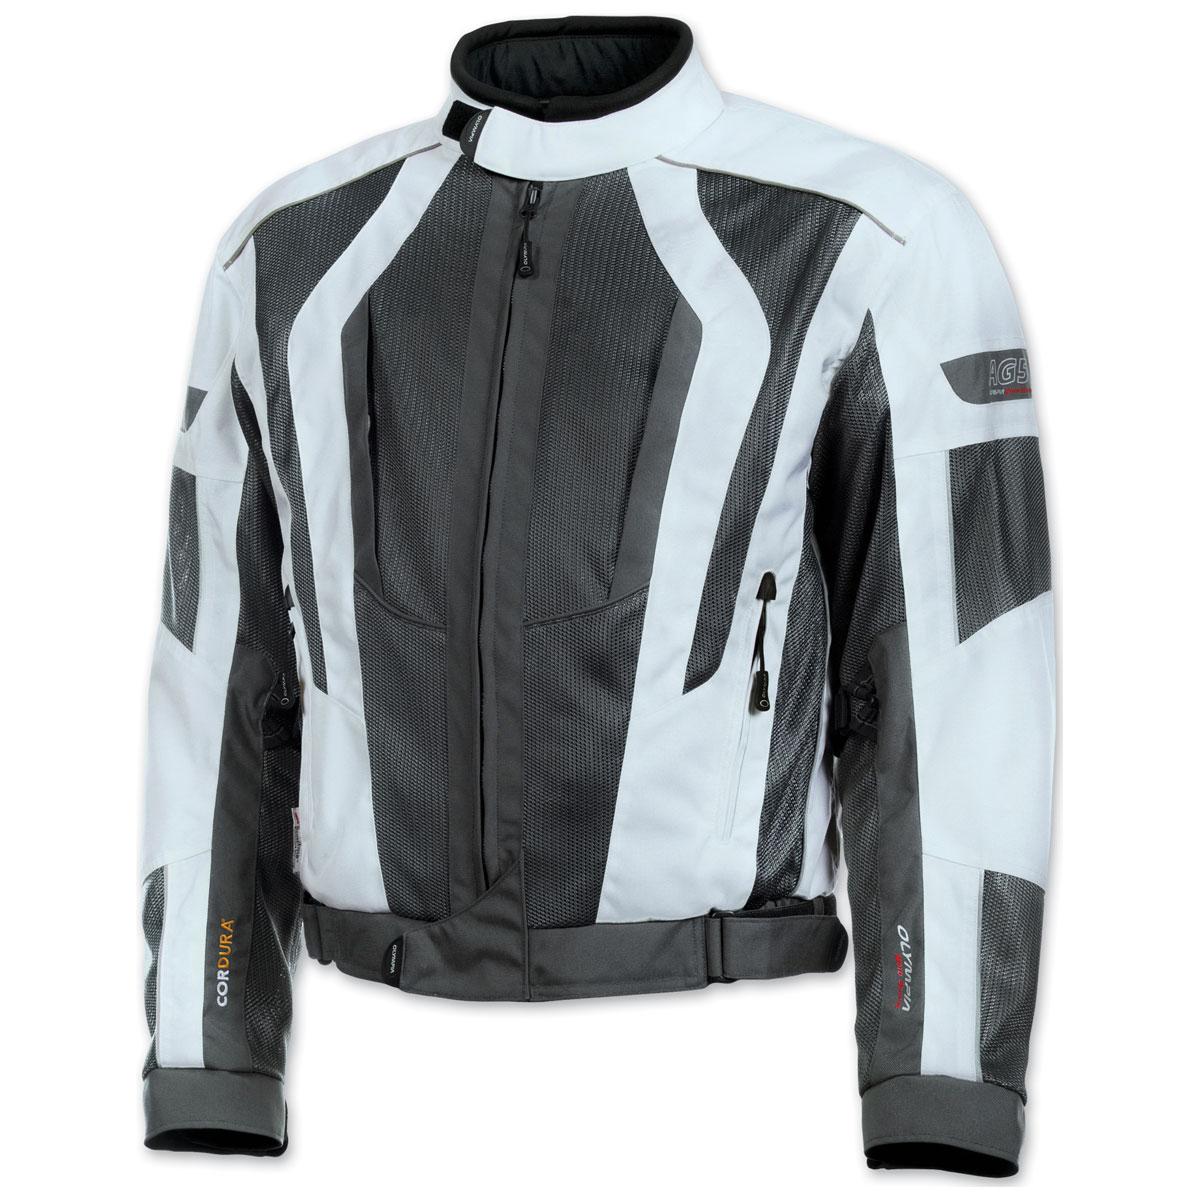 Olympia Moto Sports Men's Airglide 5 Mesh Tech Ivory Jacket